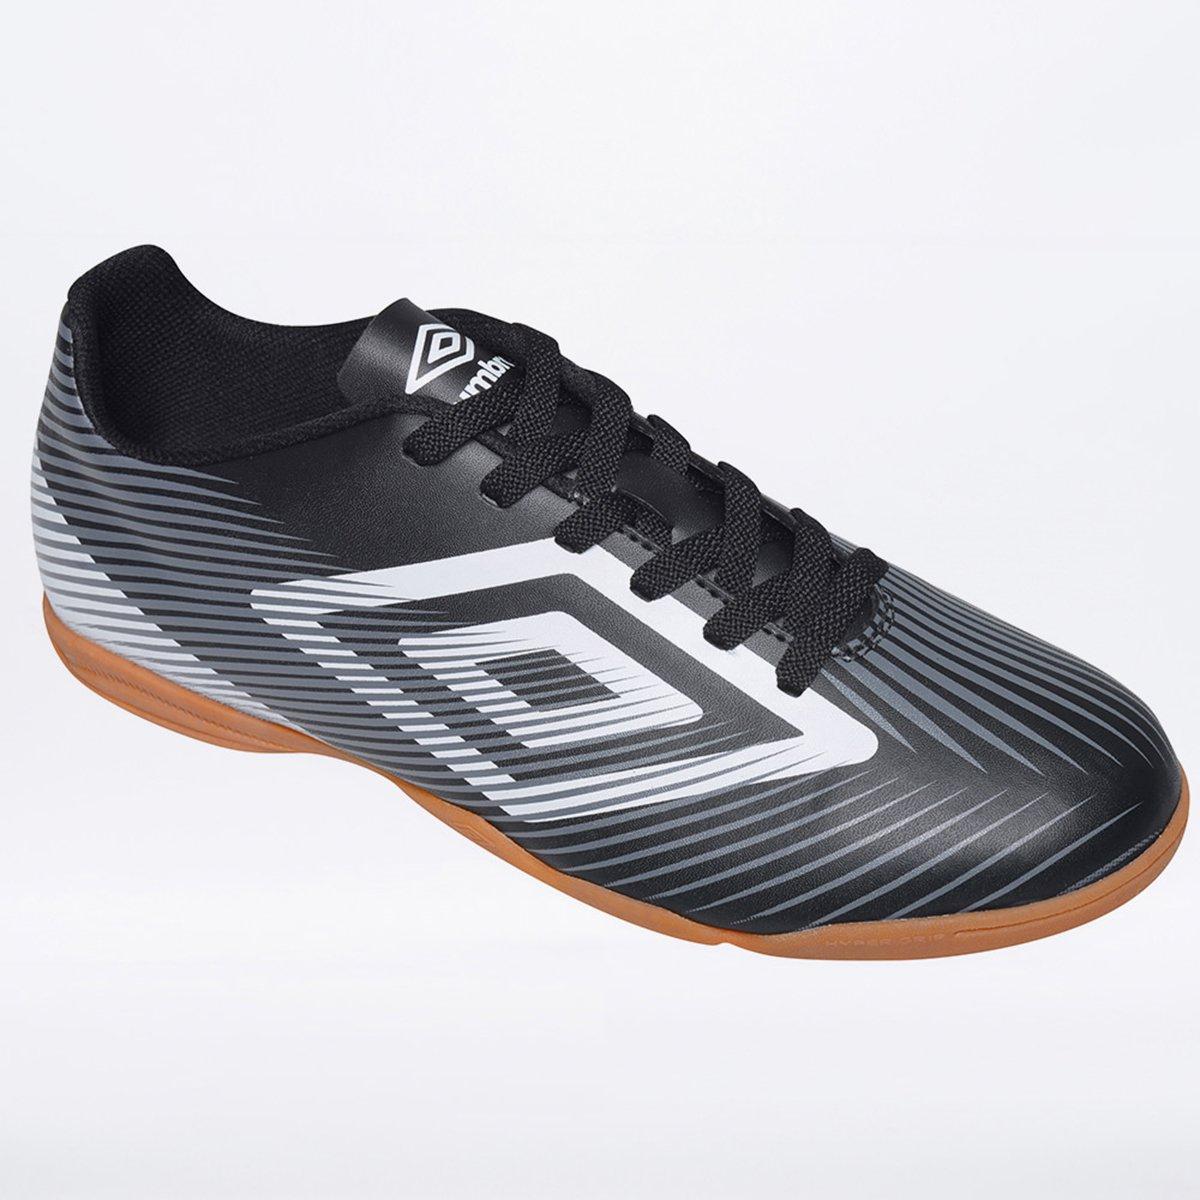 bbdb4f8b090 Chuteira Futsal Umbro Speed II Masculina - Compre Agora